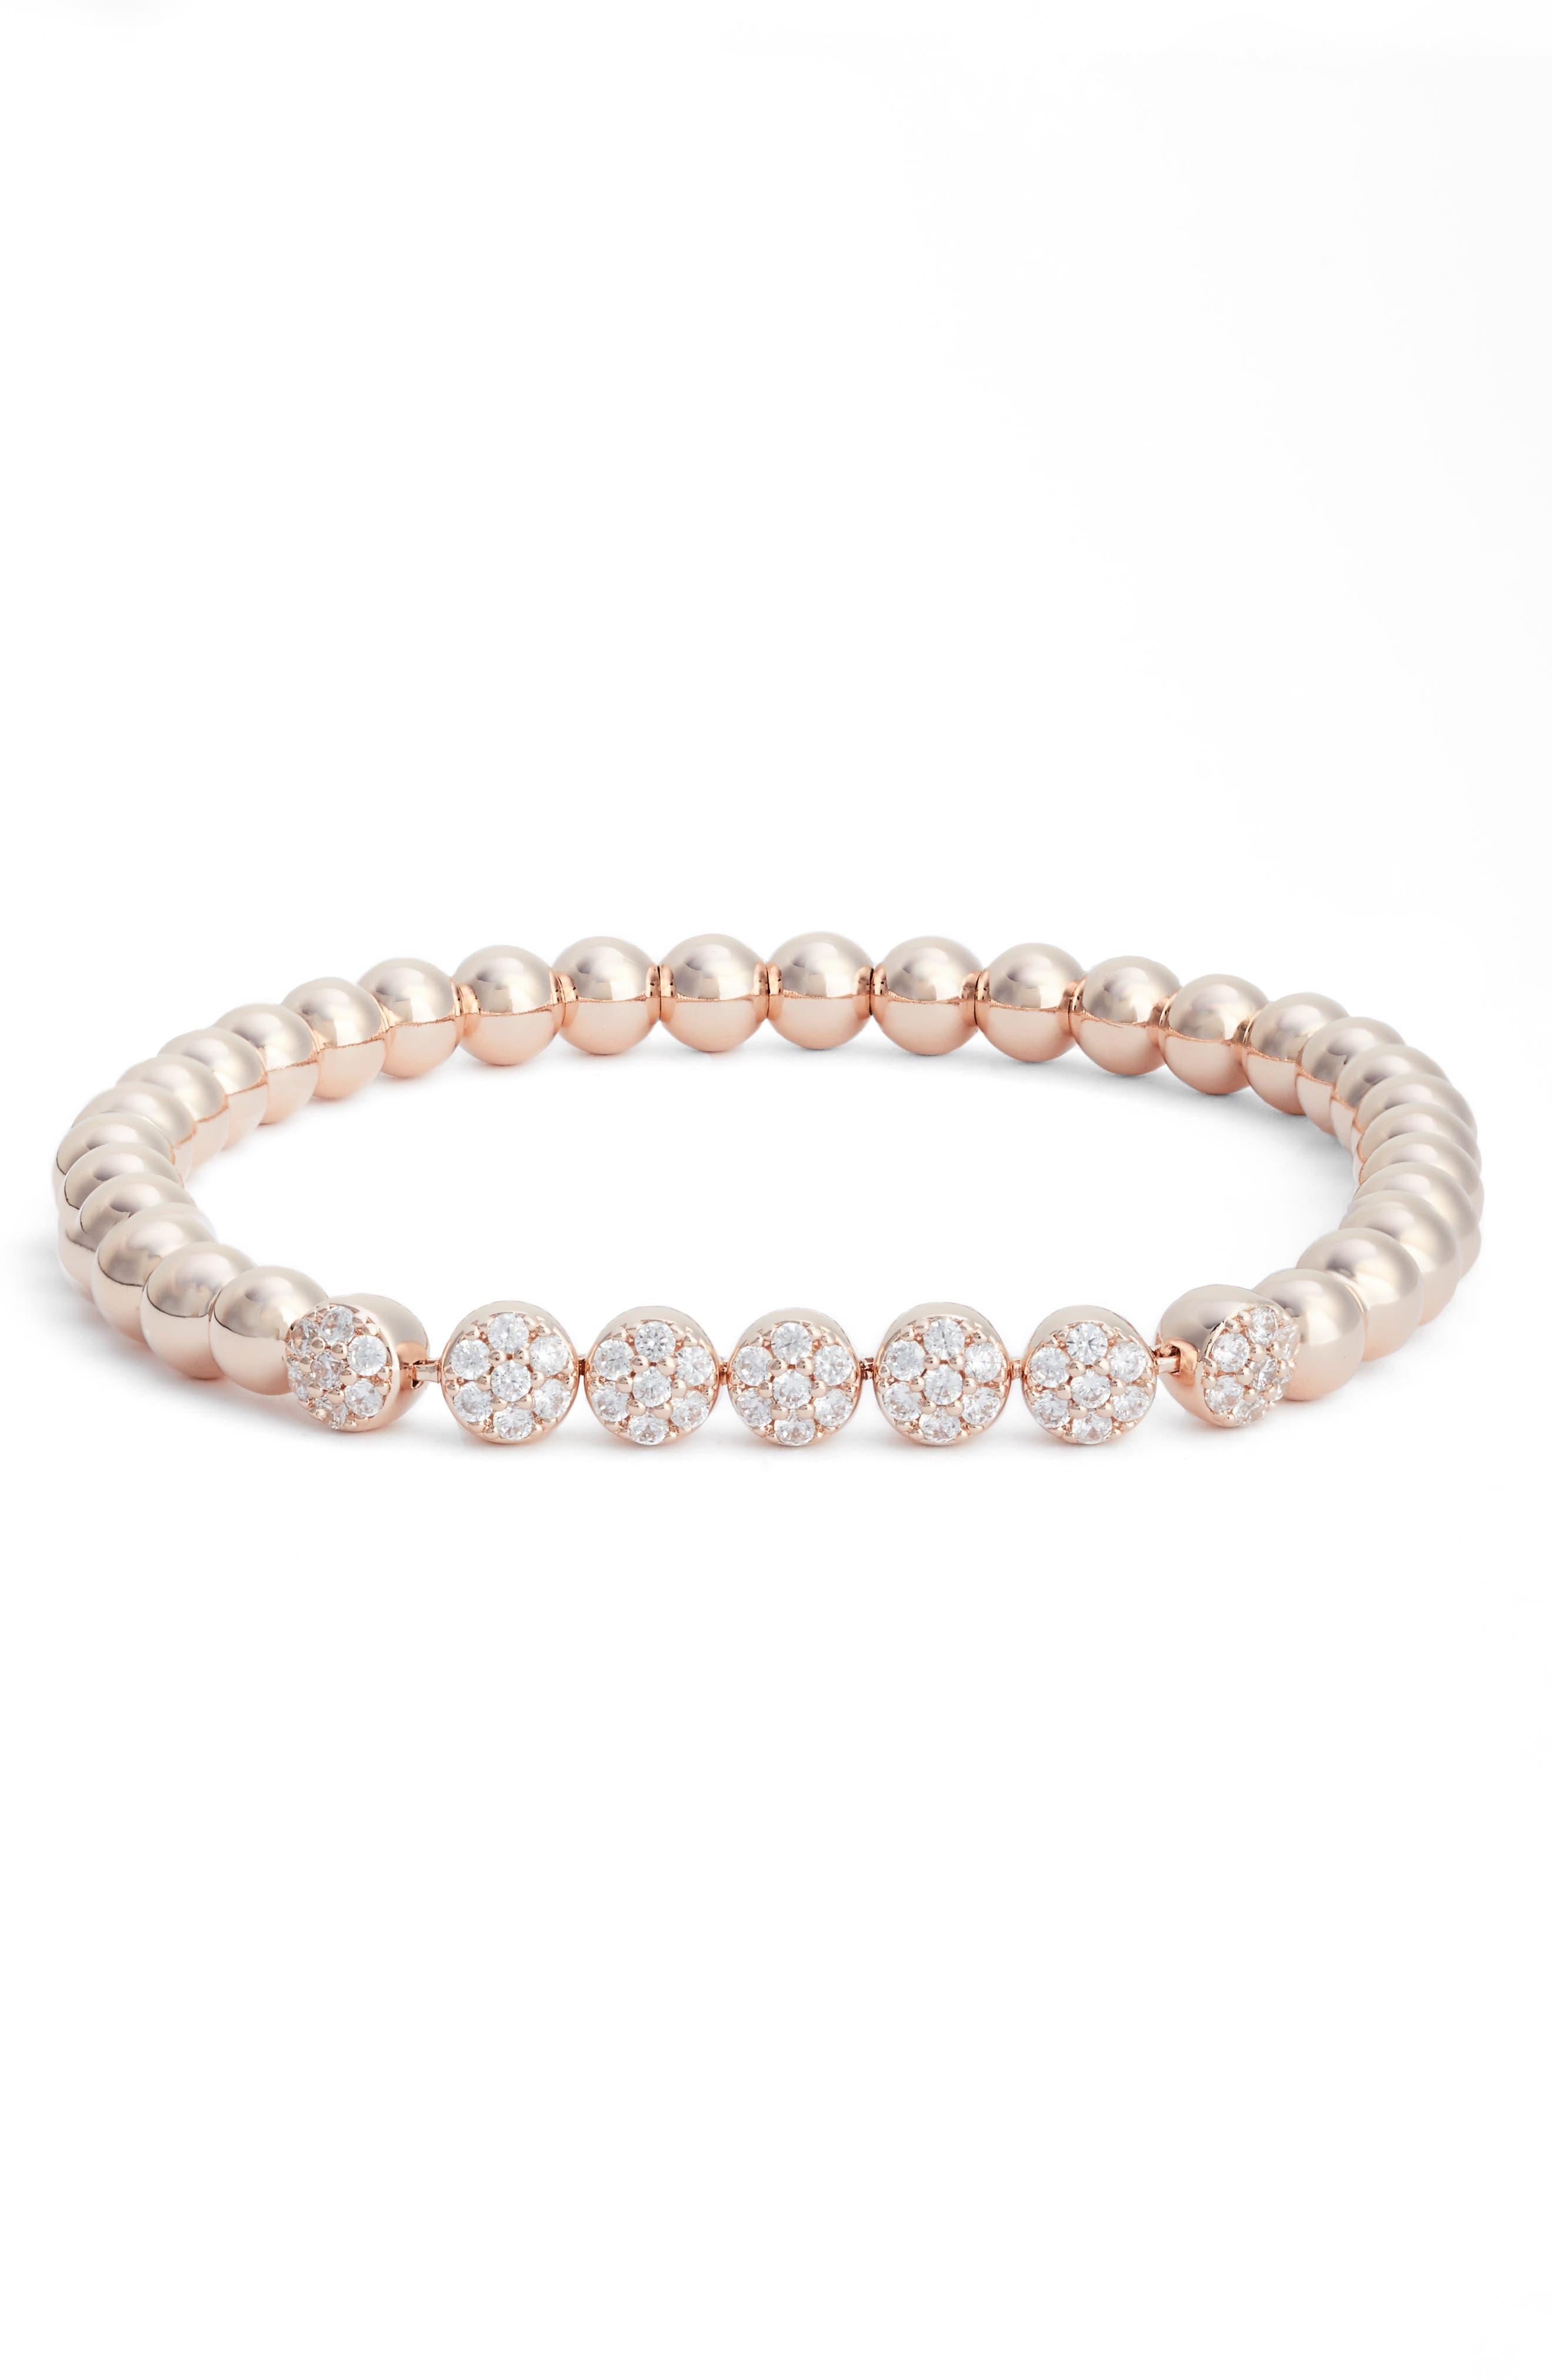 Cubic Zirconia Bracelet,                         Main,                         color, Rose Gold/ Clear